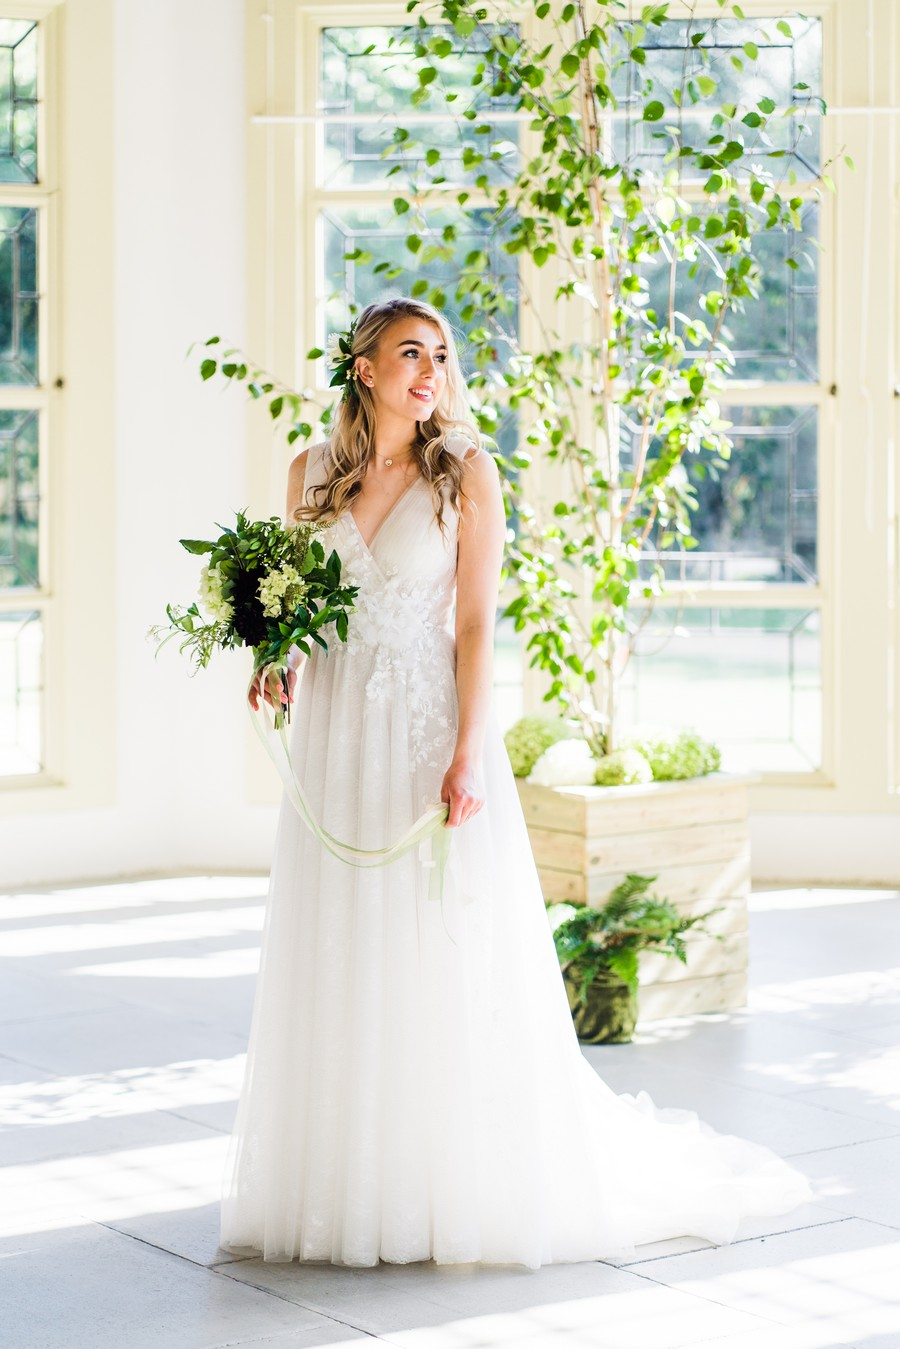 Highcliffe Castle wedding inspiration on the English Wedding Blog (29)